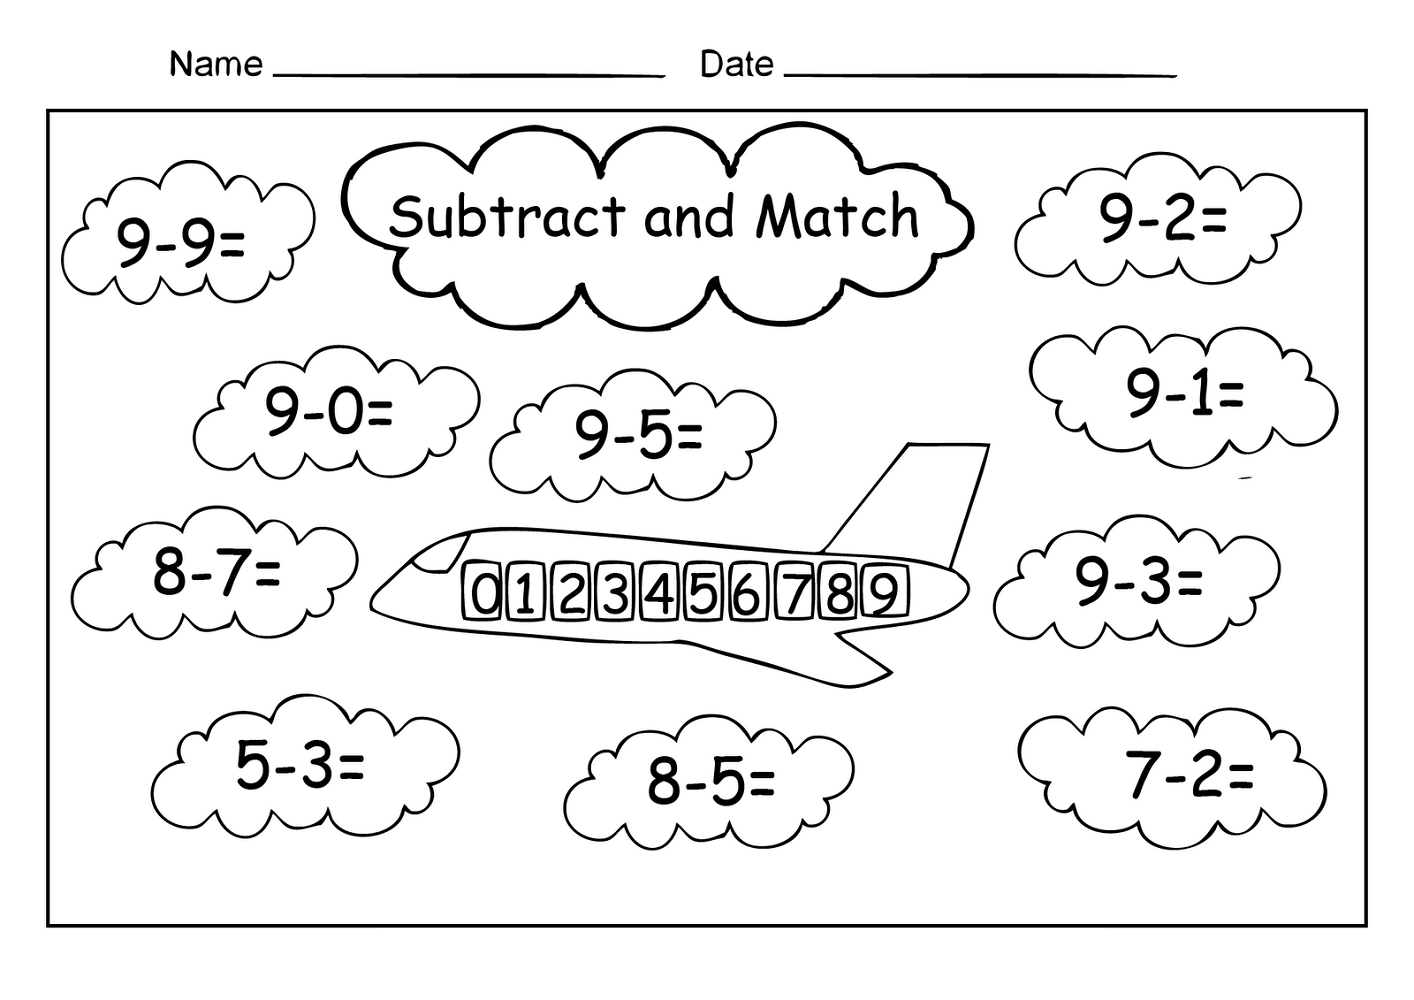 - Free Easy Math Worksheets For 1st Grade Math Worksheets On Best